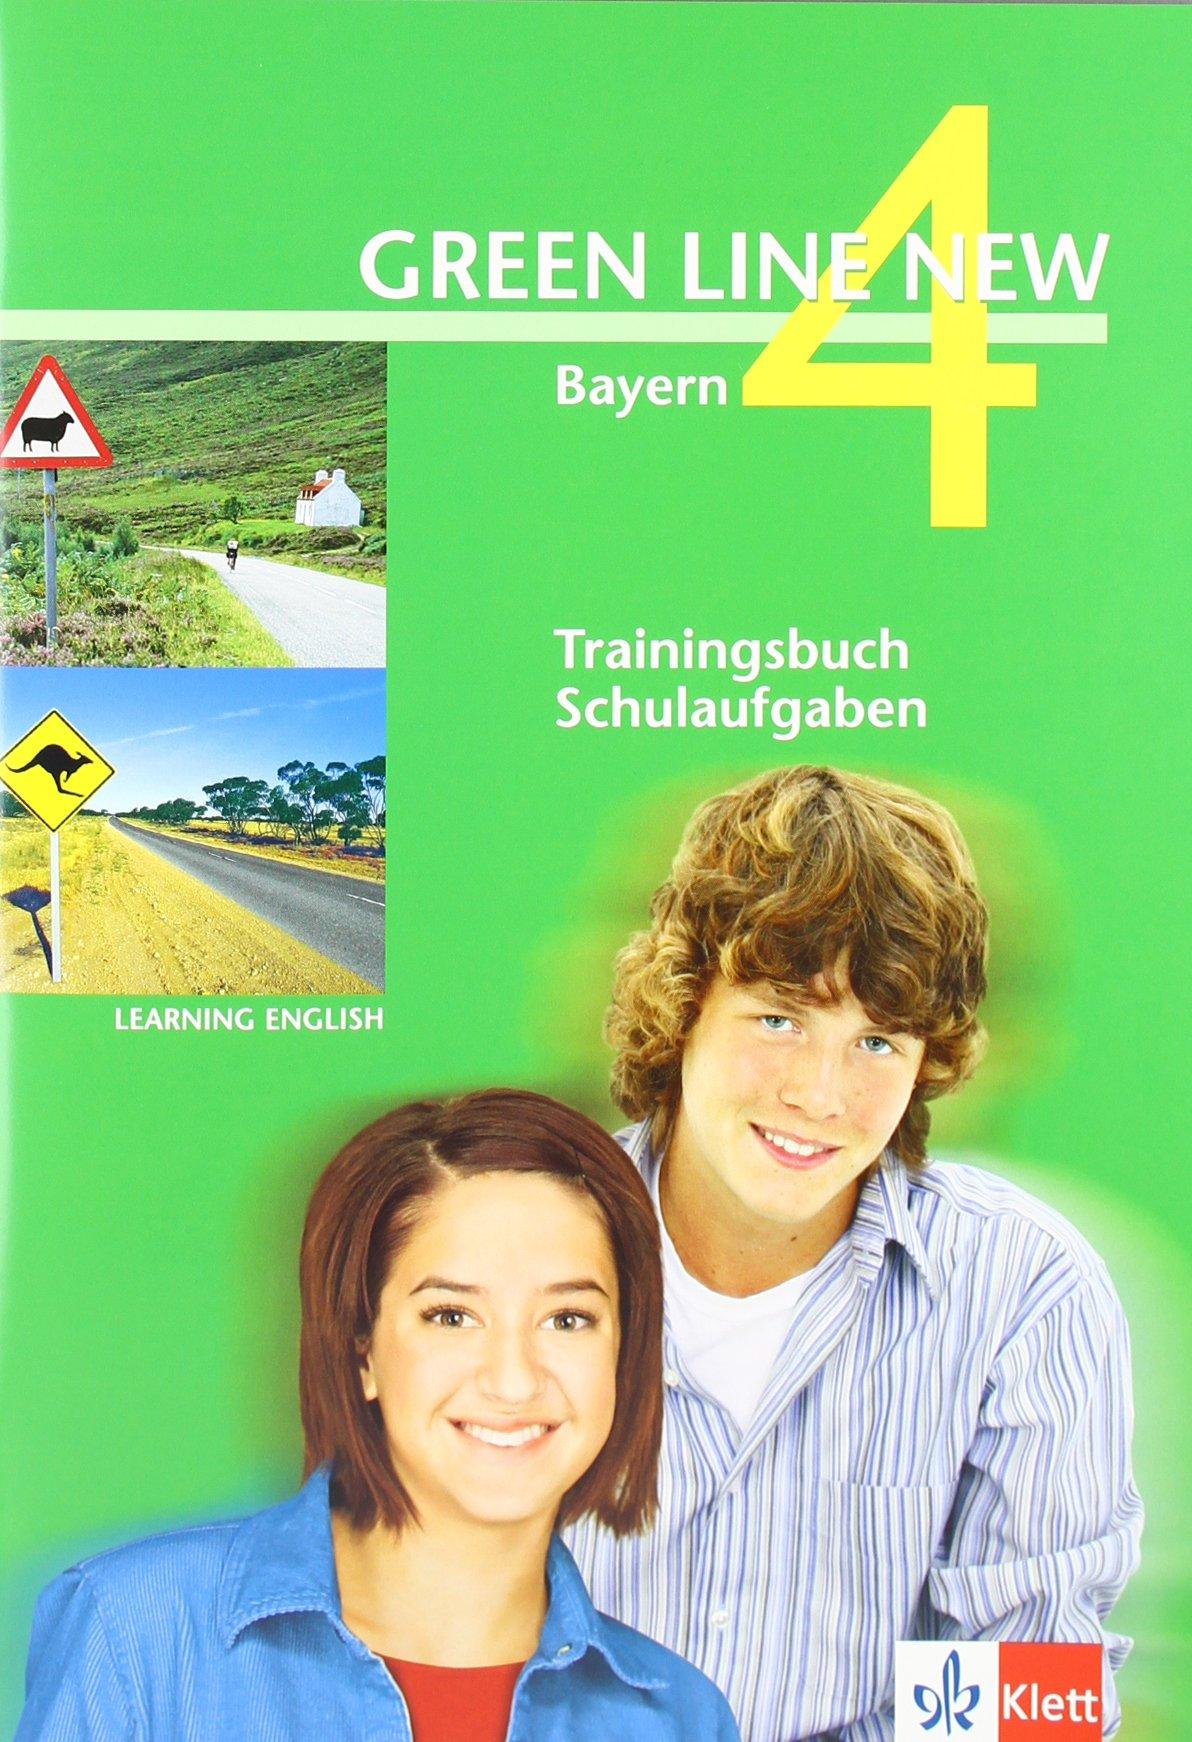 Download Learning English Green Line New 4. Trainingsbuch Schulaufgaben. Bayern PDF